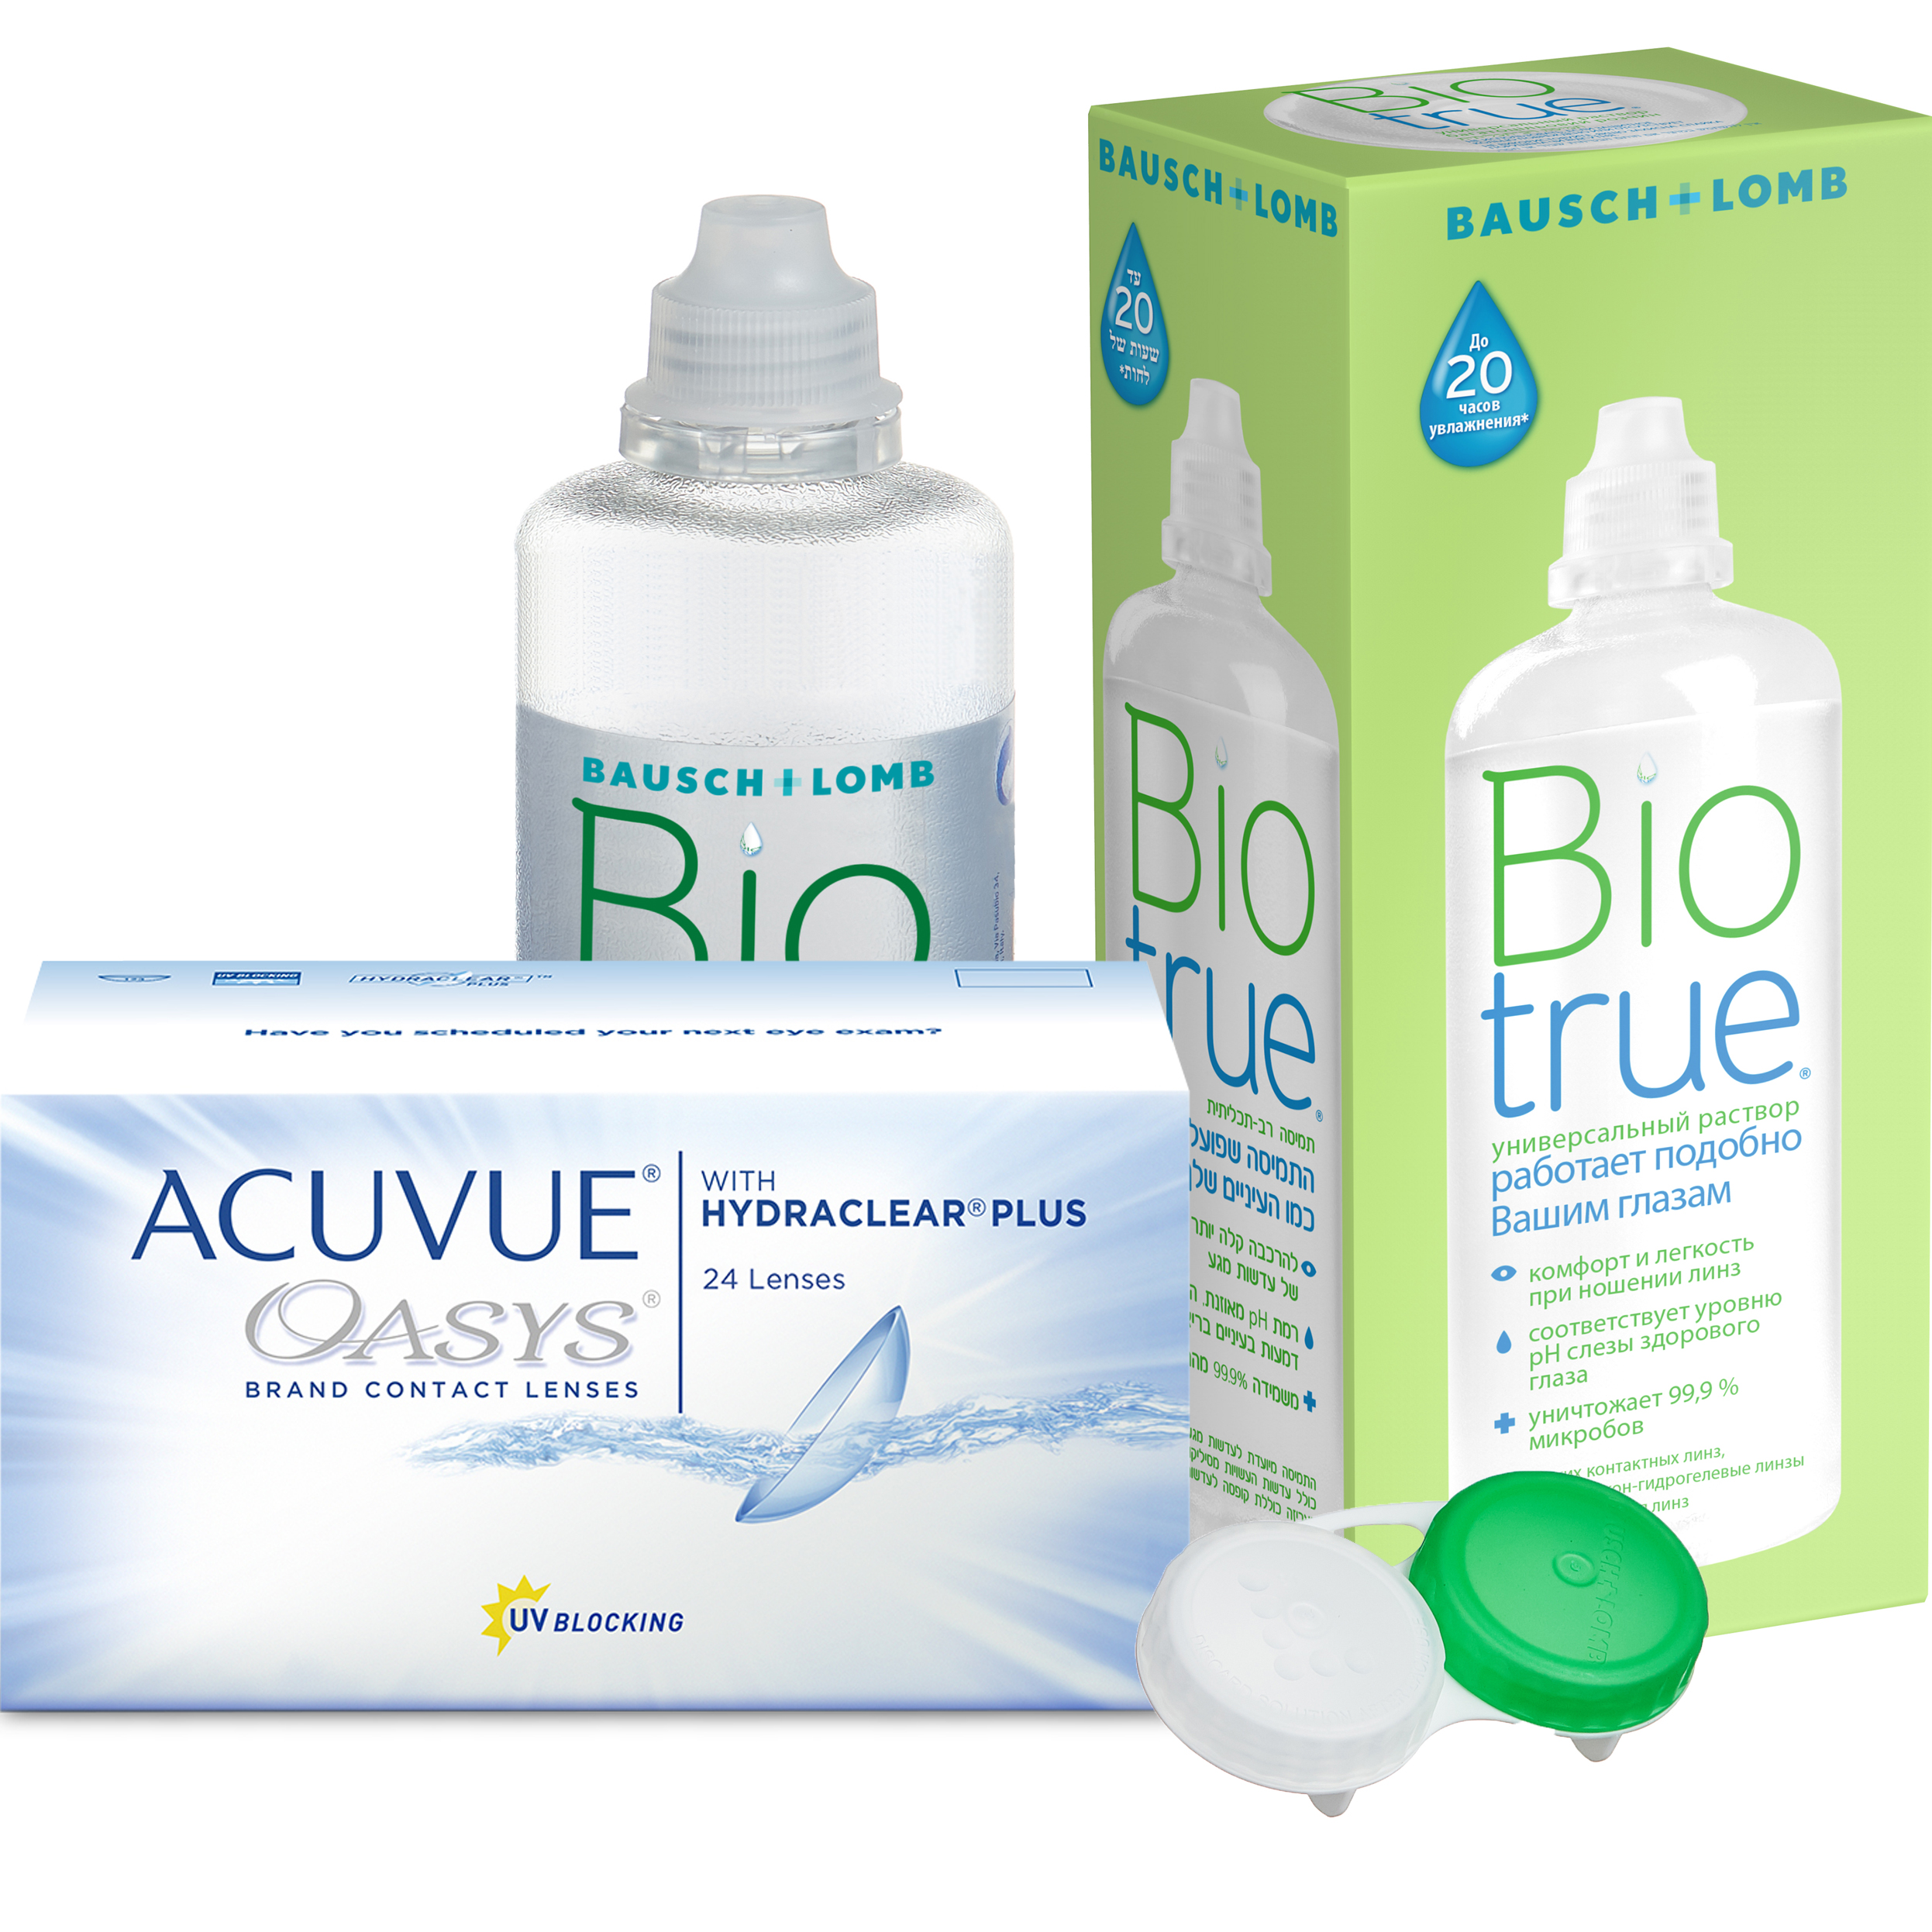 Купить Oasys with Hydraclear Plus 24 линзы + Biotrue, Контактные линзы Acuvue Oasys with Hydraclear Plus 24 линзы R 8.4 +8, 00 + Biotrue 300 мл